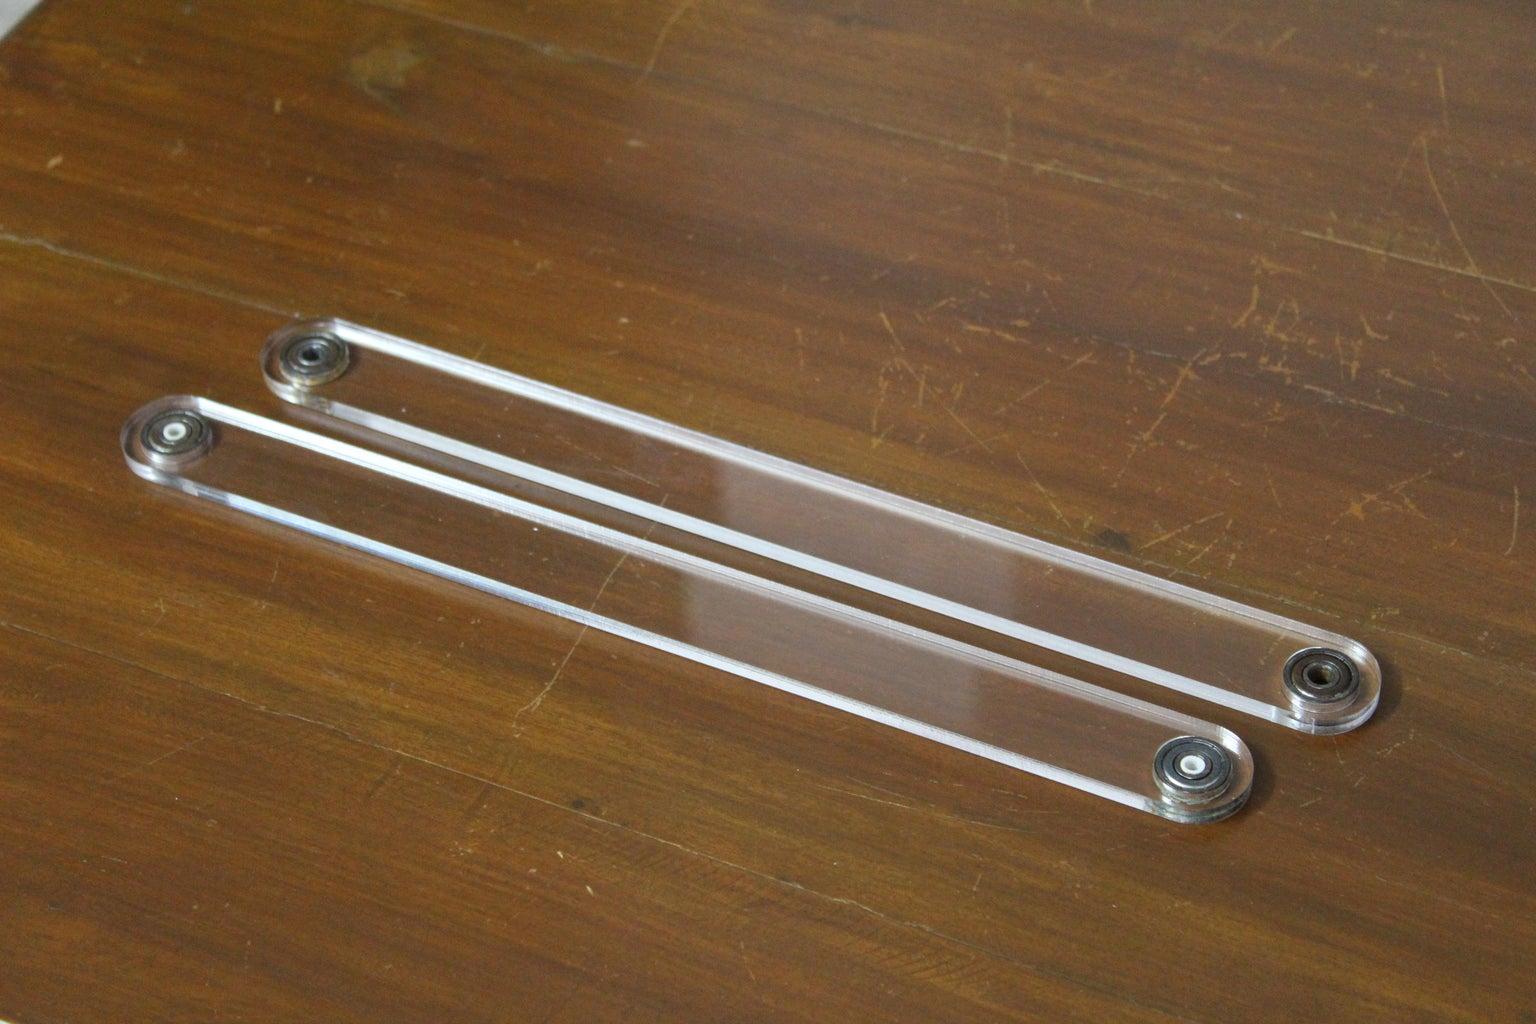 Assembling the Pendulum Arms